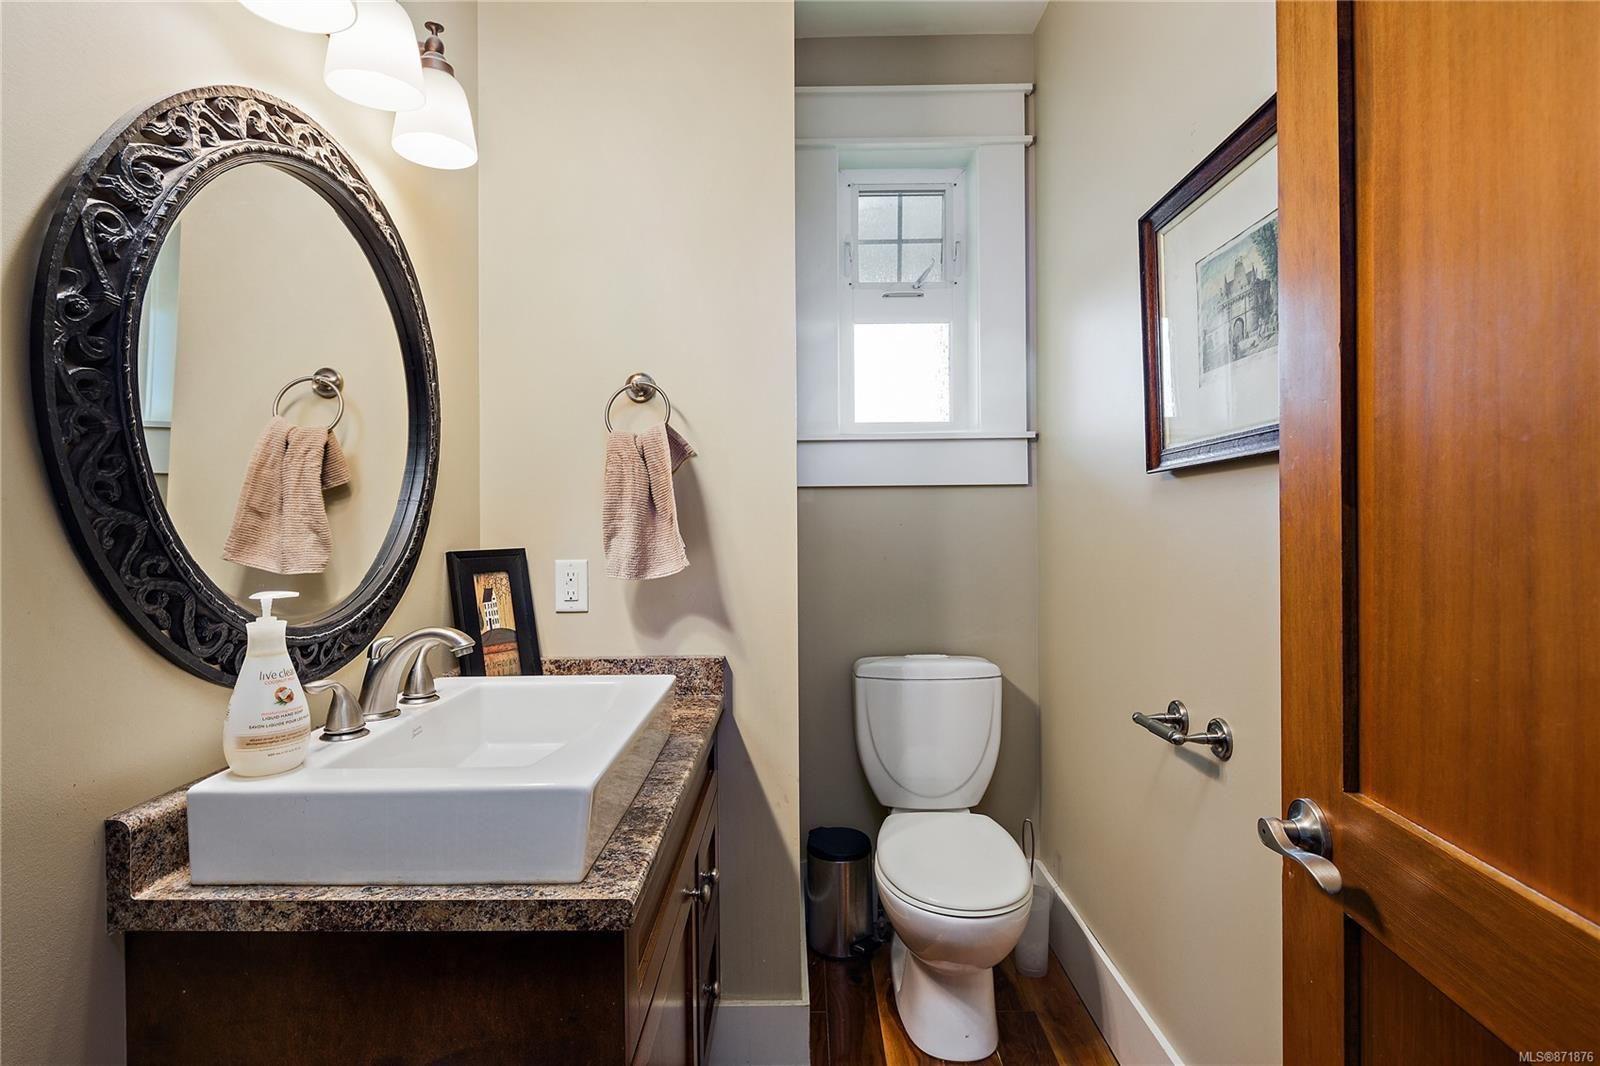 Photo 29: Photos: 4420 Wilkinson Rd in : SW Royal Oak House for sale (Saanich West)  : MLS®# 871876